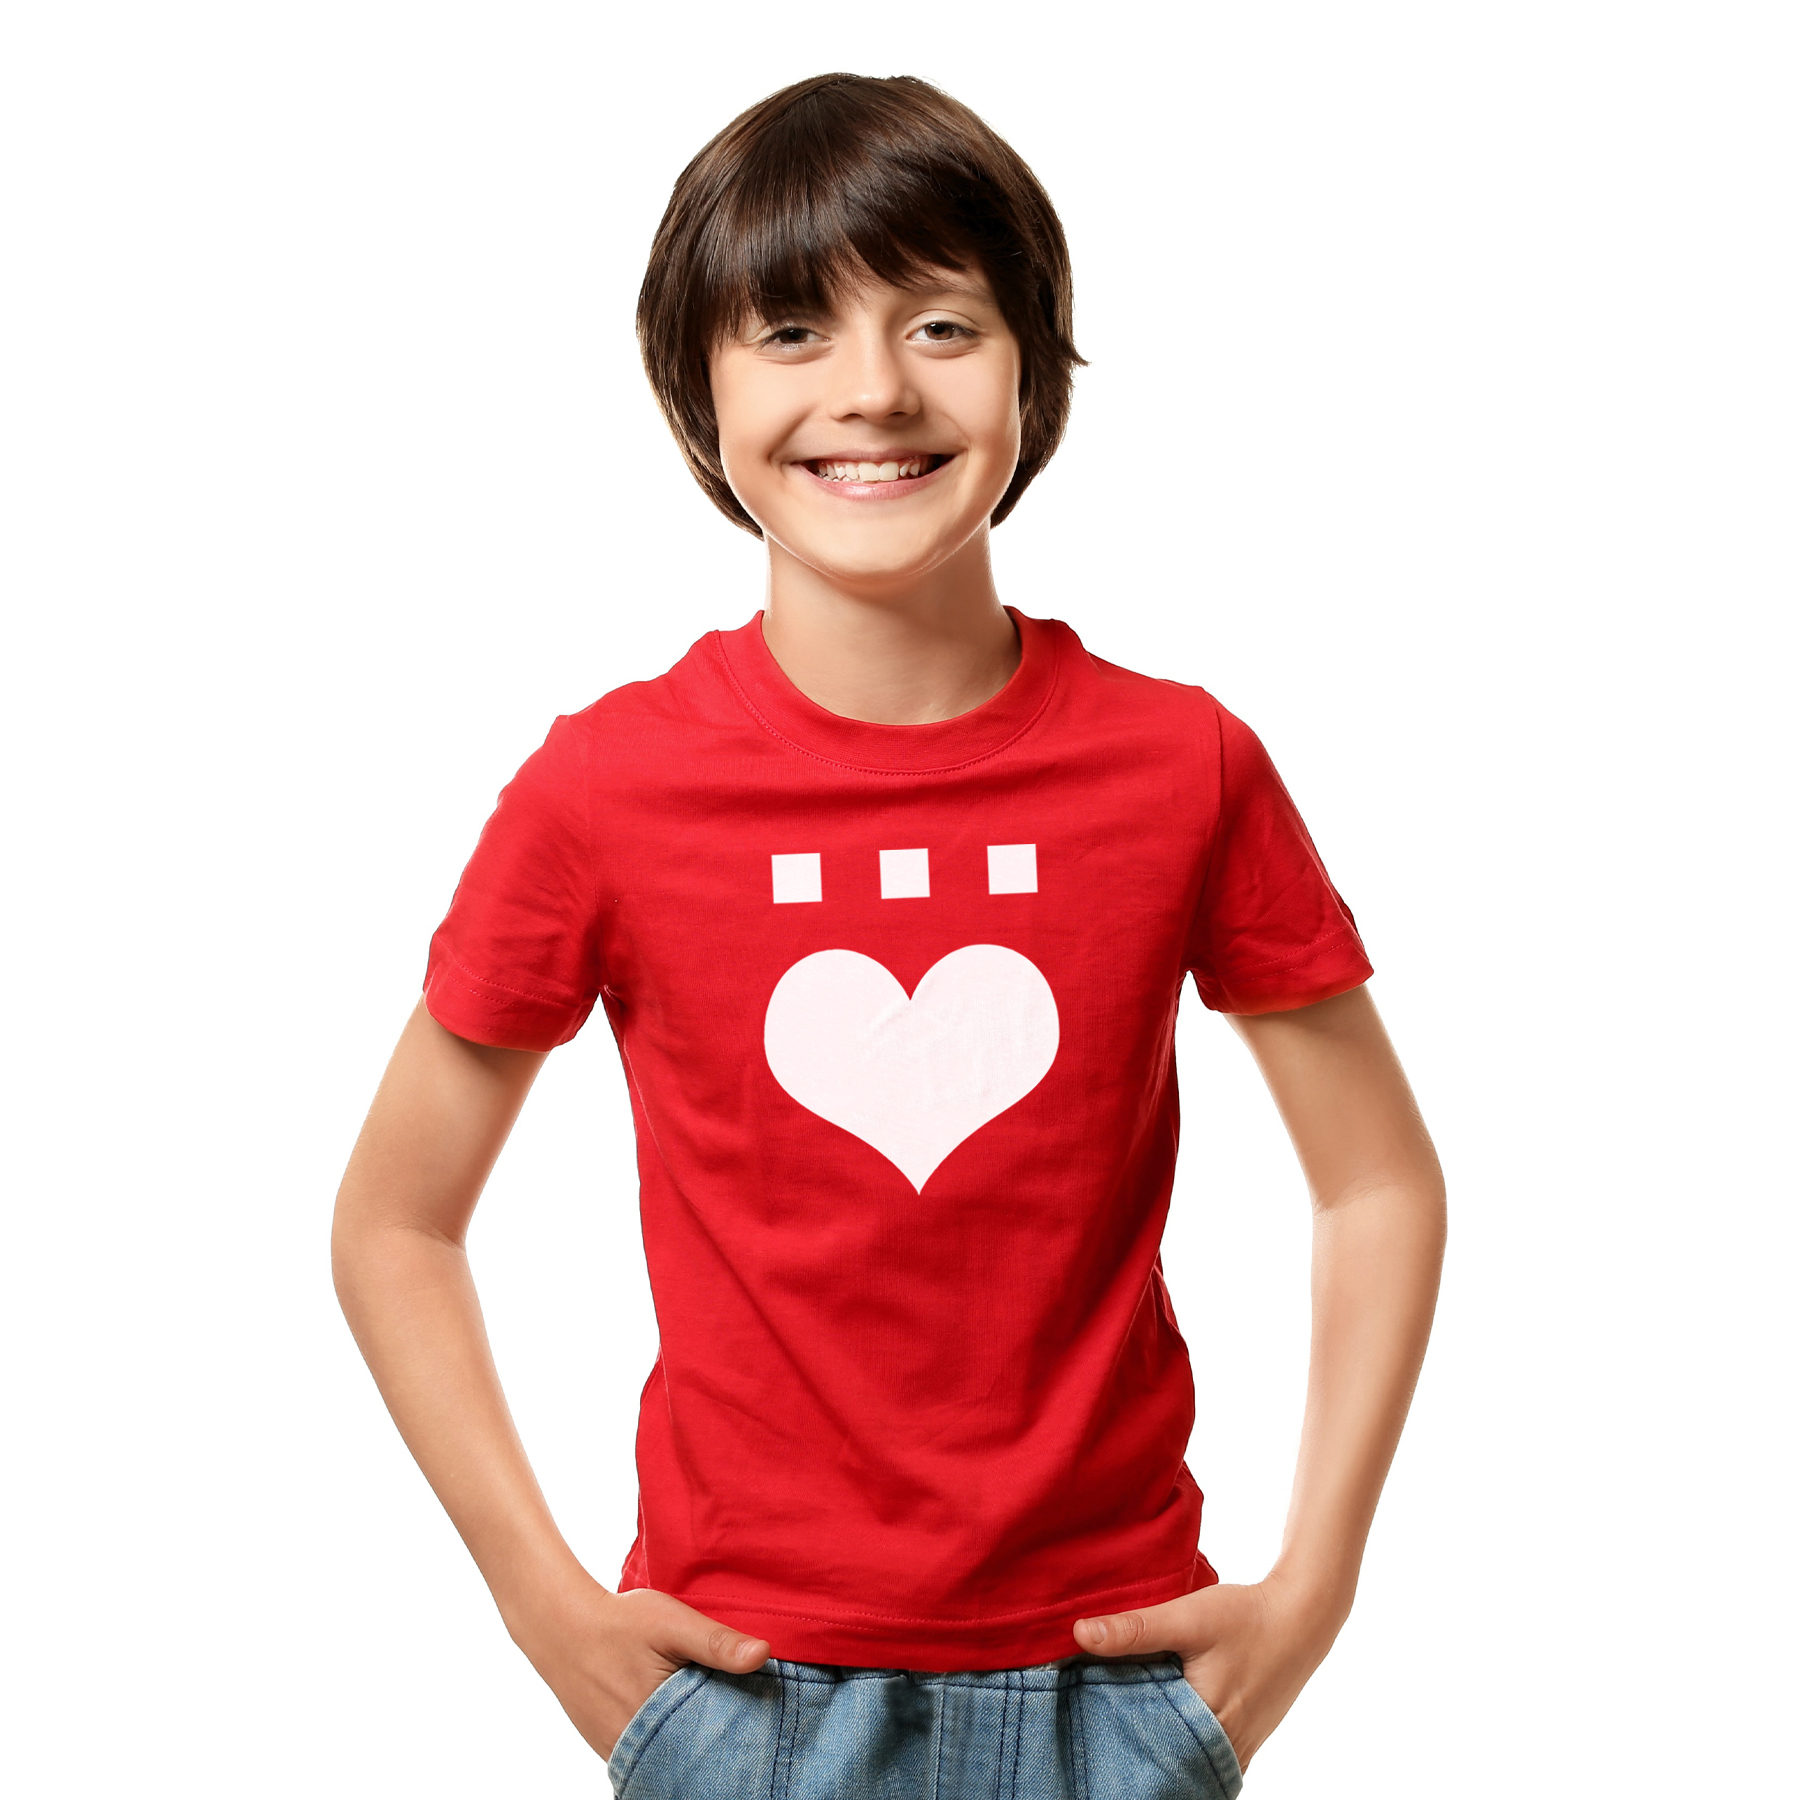 Härz Rot   Kinder Shirt